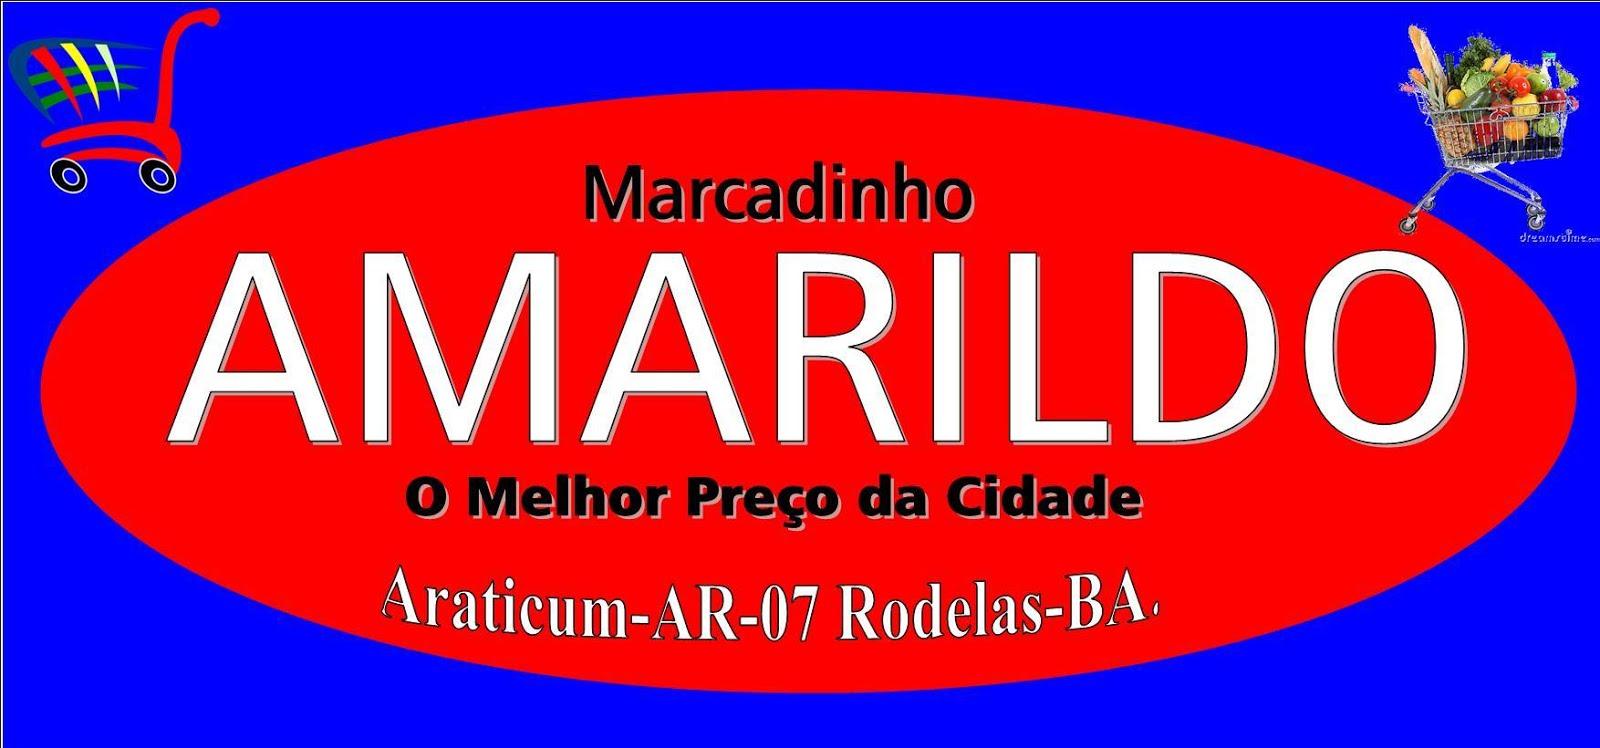 Mercadinho Amarildo